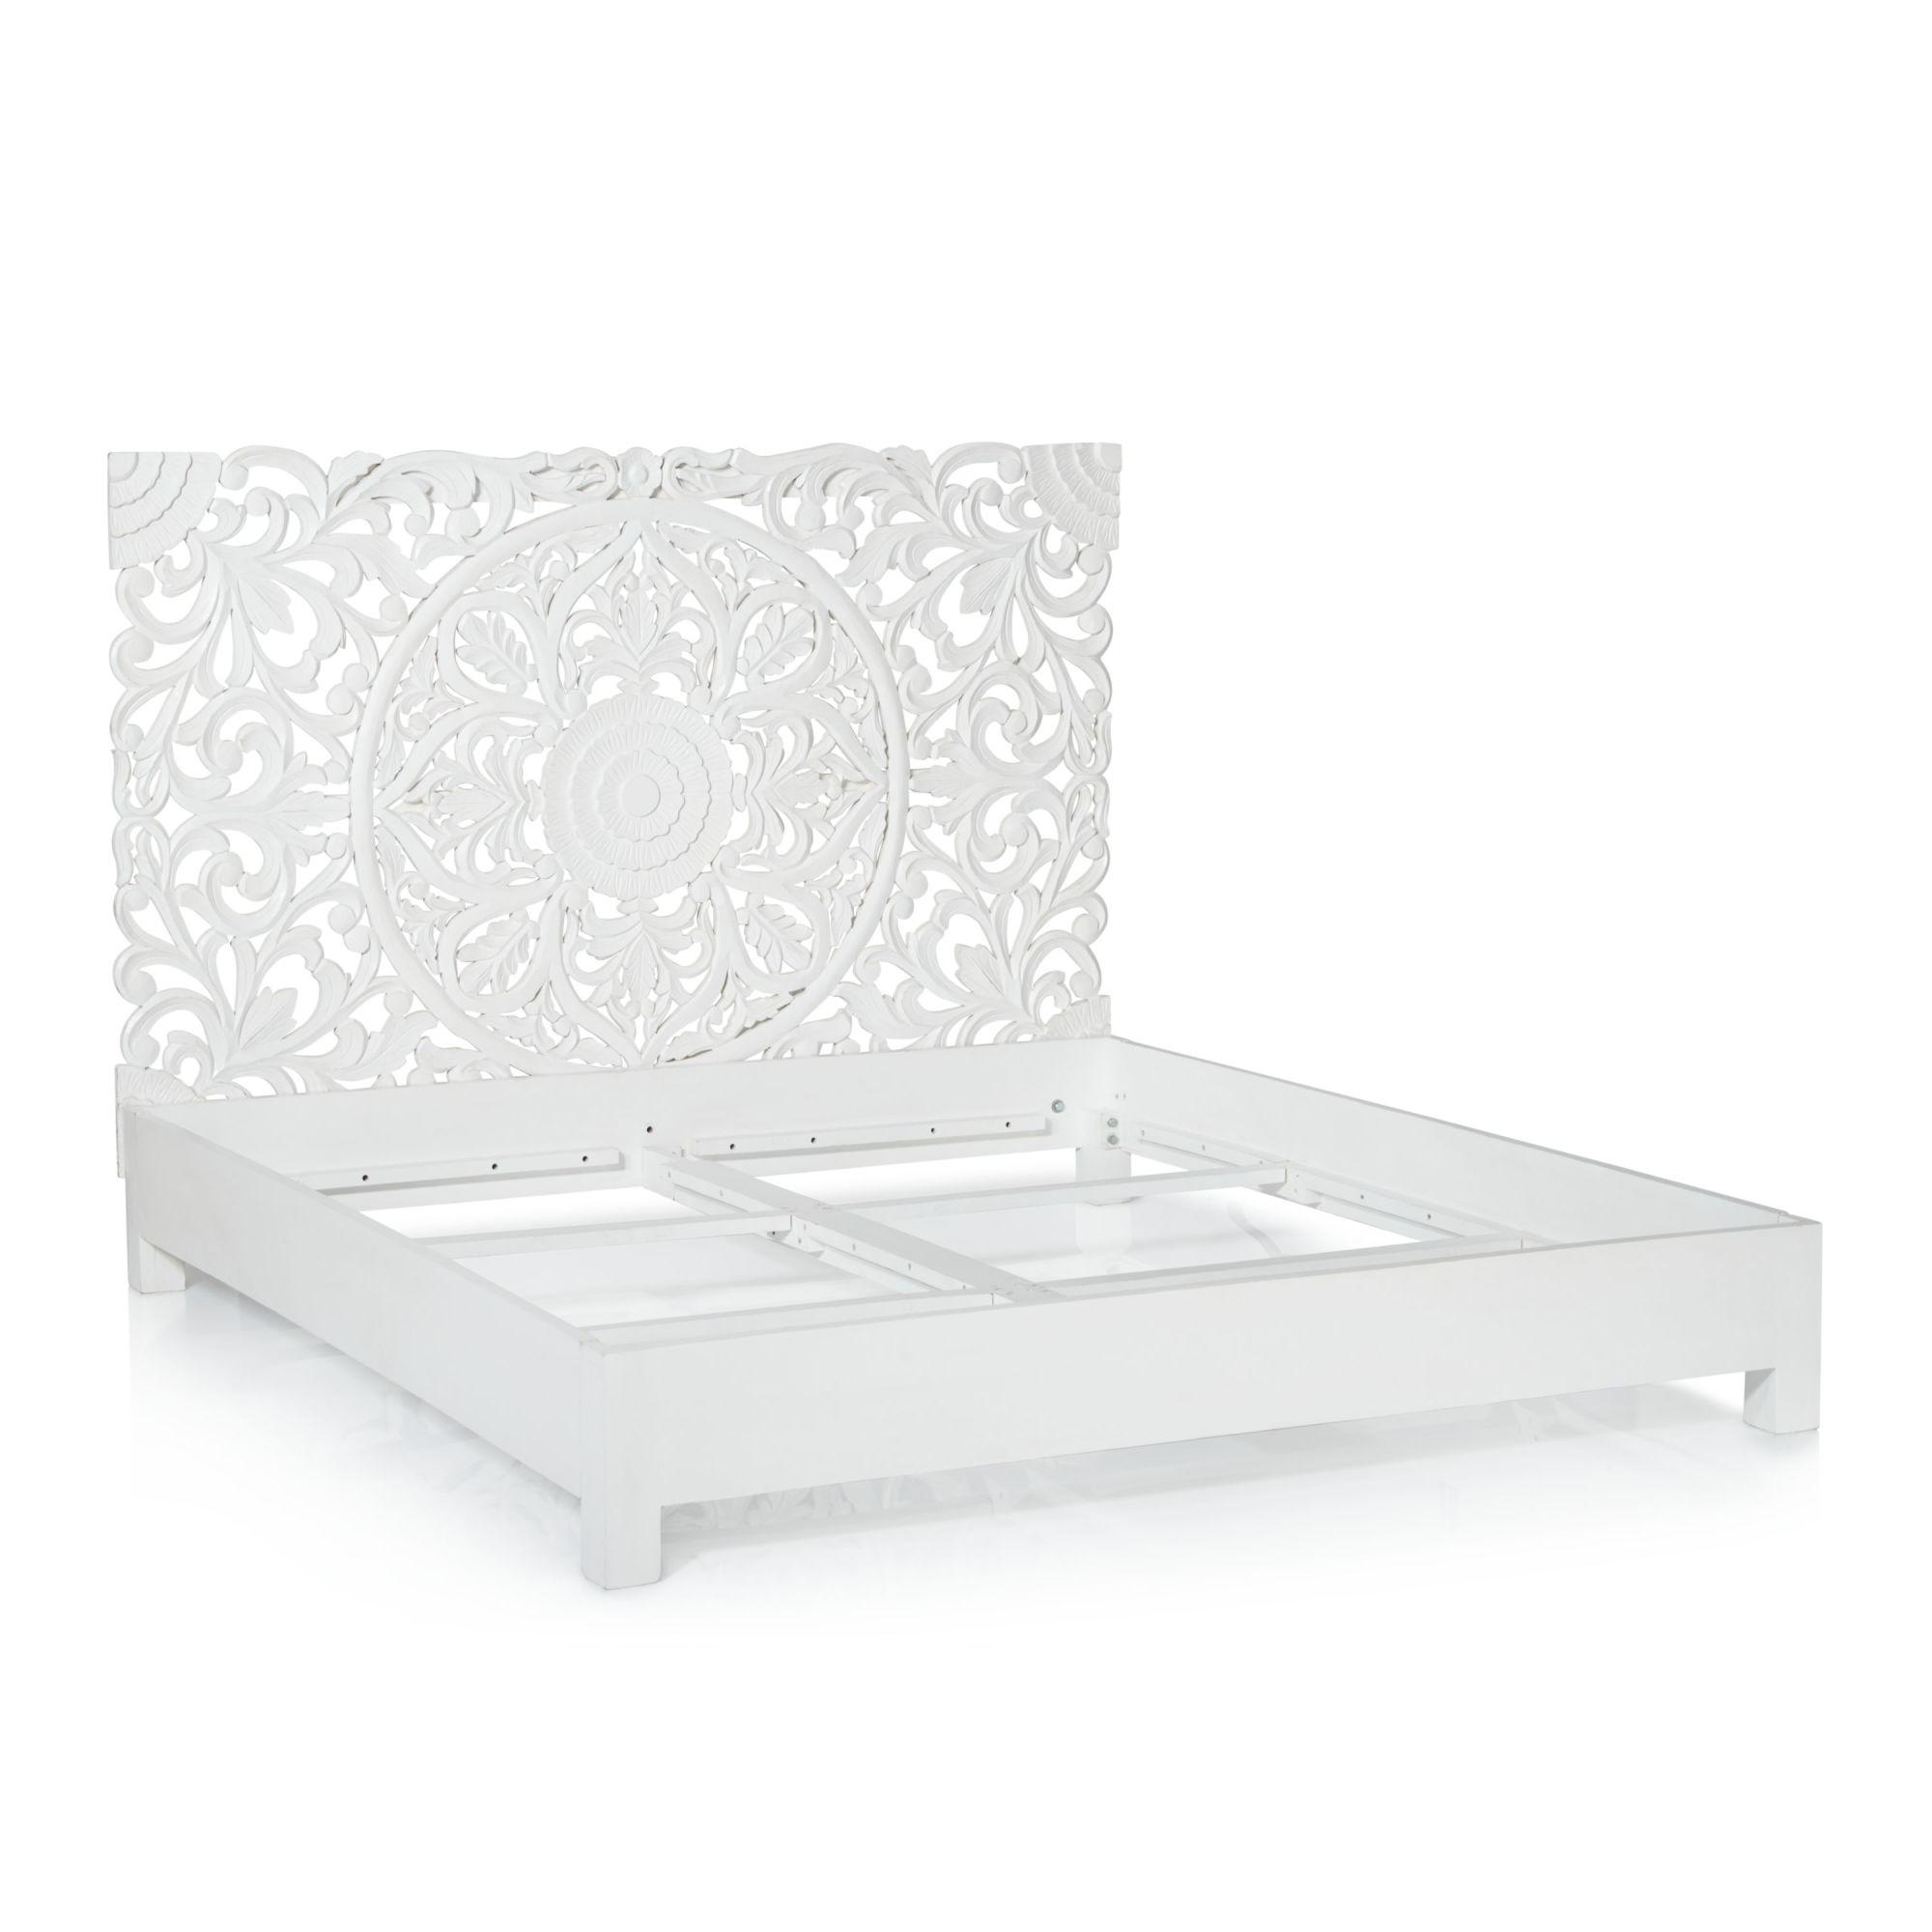 abverkauf schlafzimmerm bel. Black Bedroom Furniture Sets. Home Design Ideas